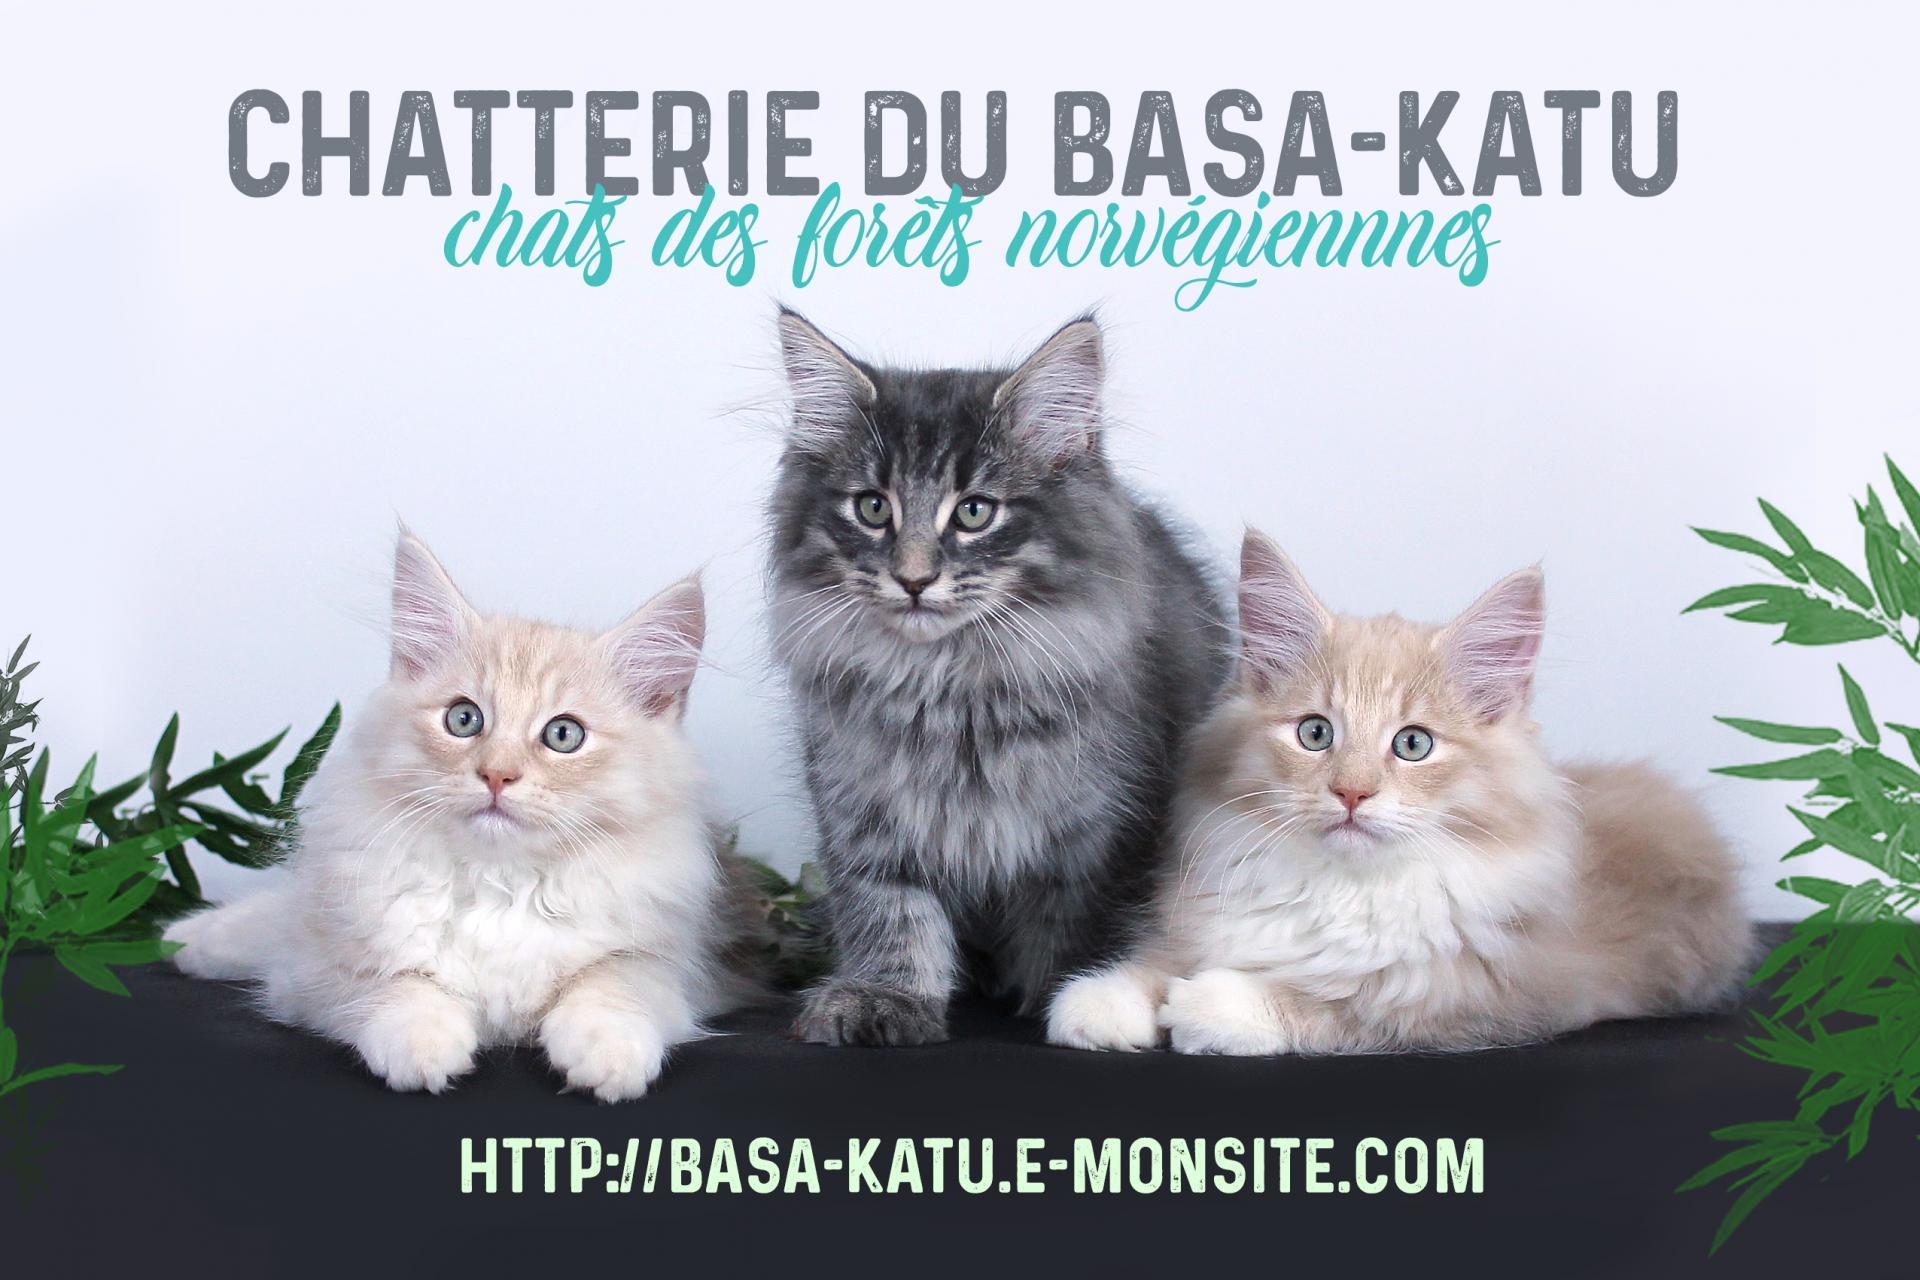 Chatterie du Basa-Katu - Facebook